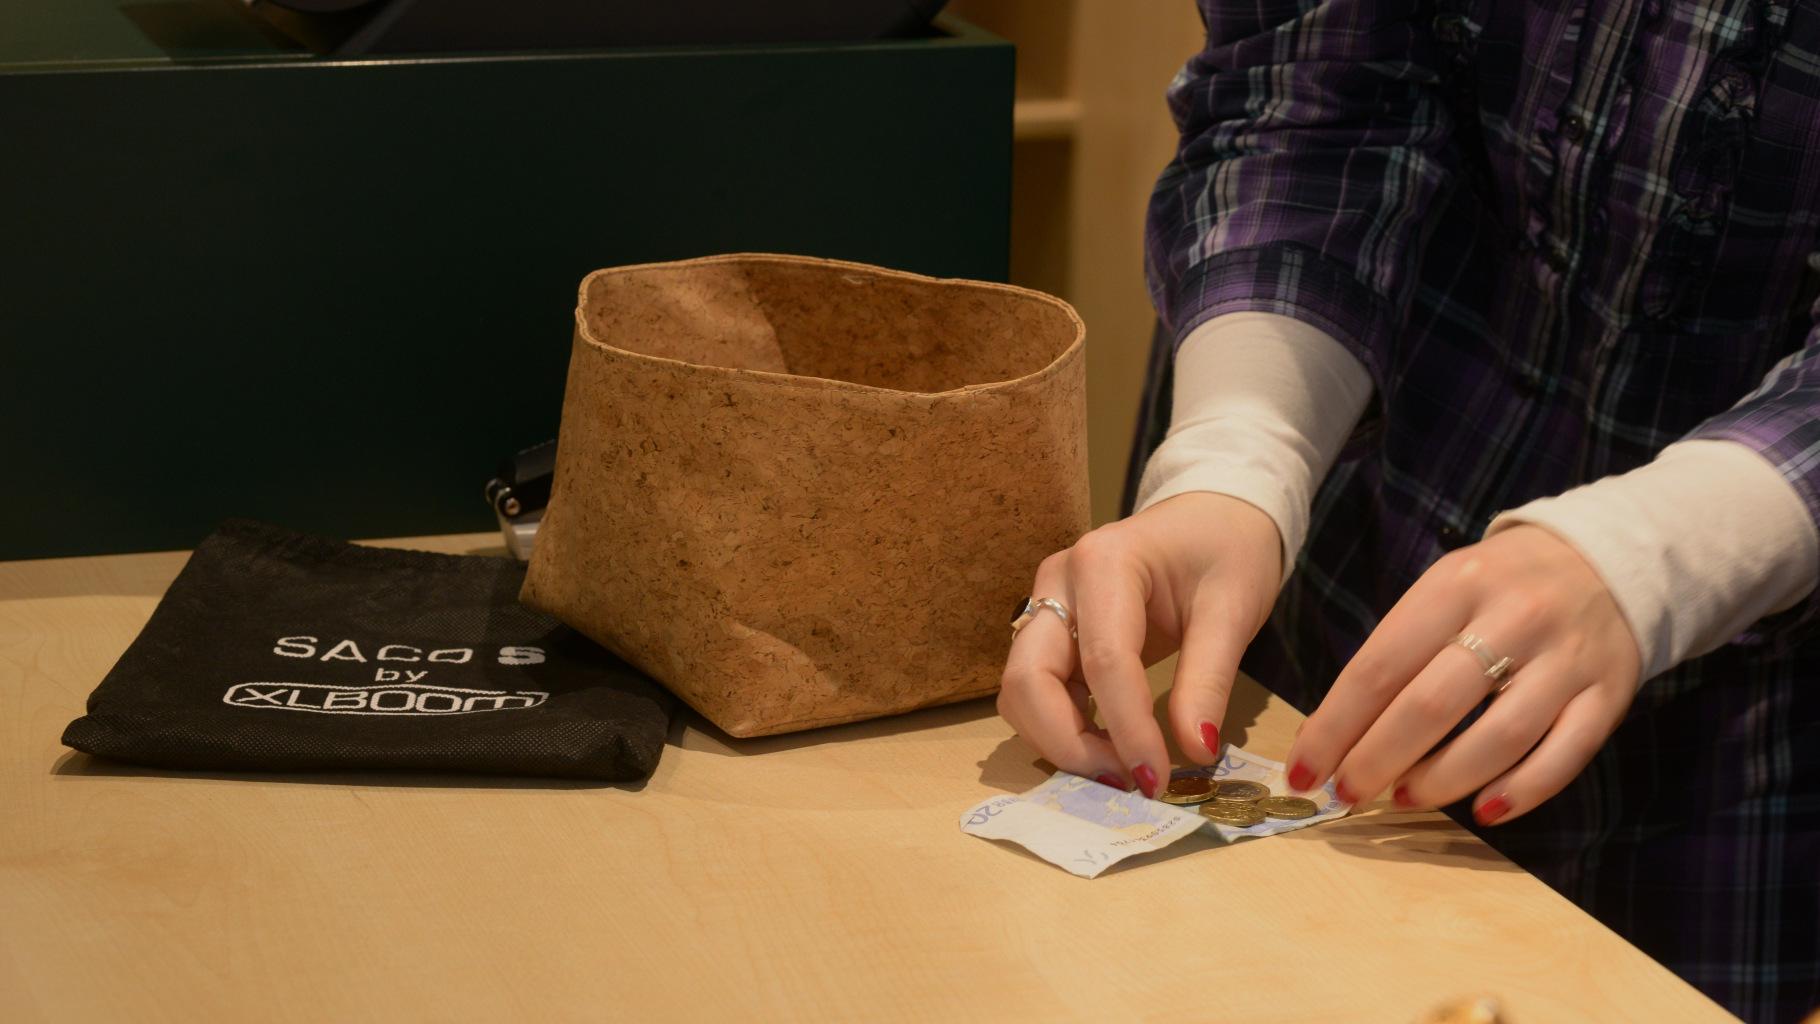 Frau bezahlt an der Kasse im Oxfam Shop